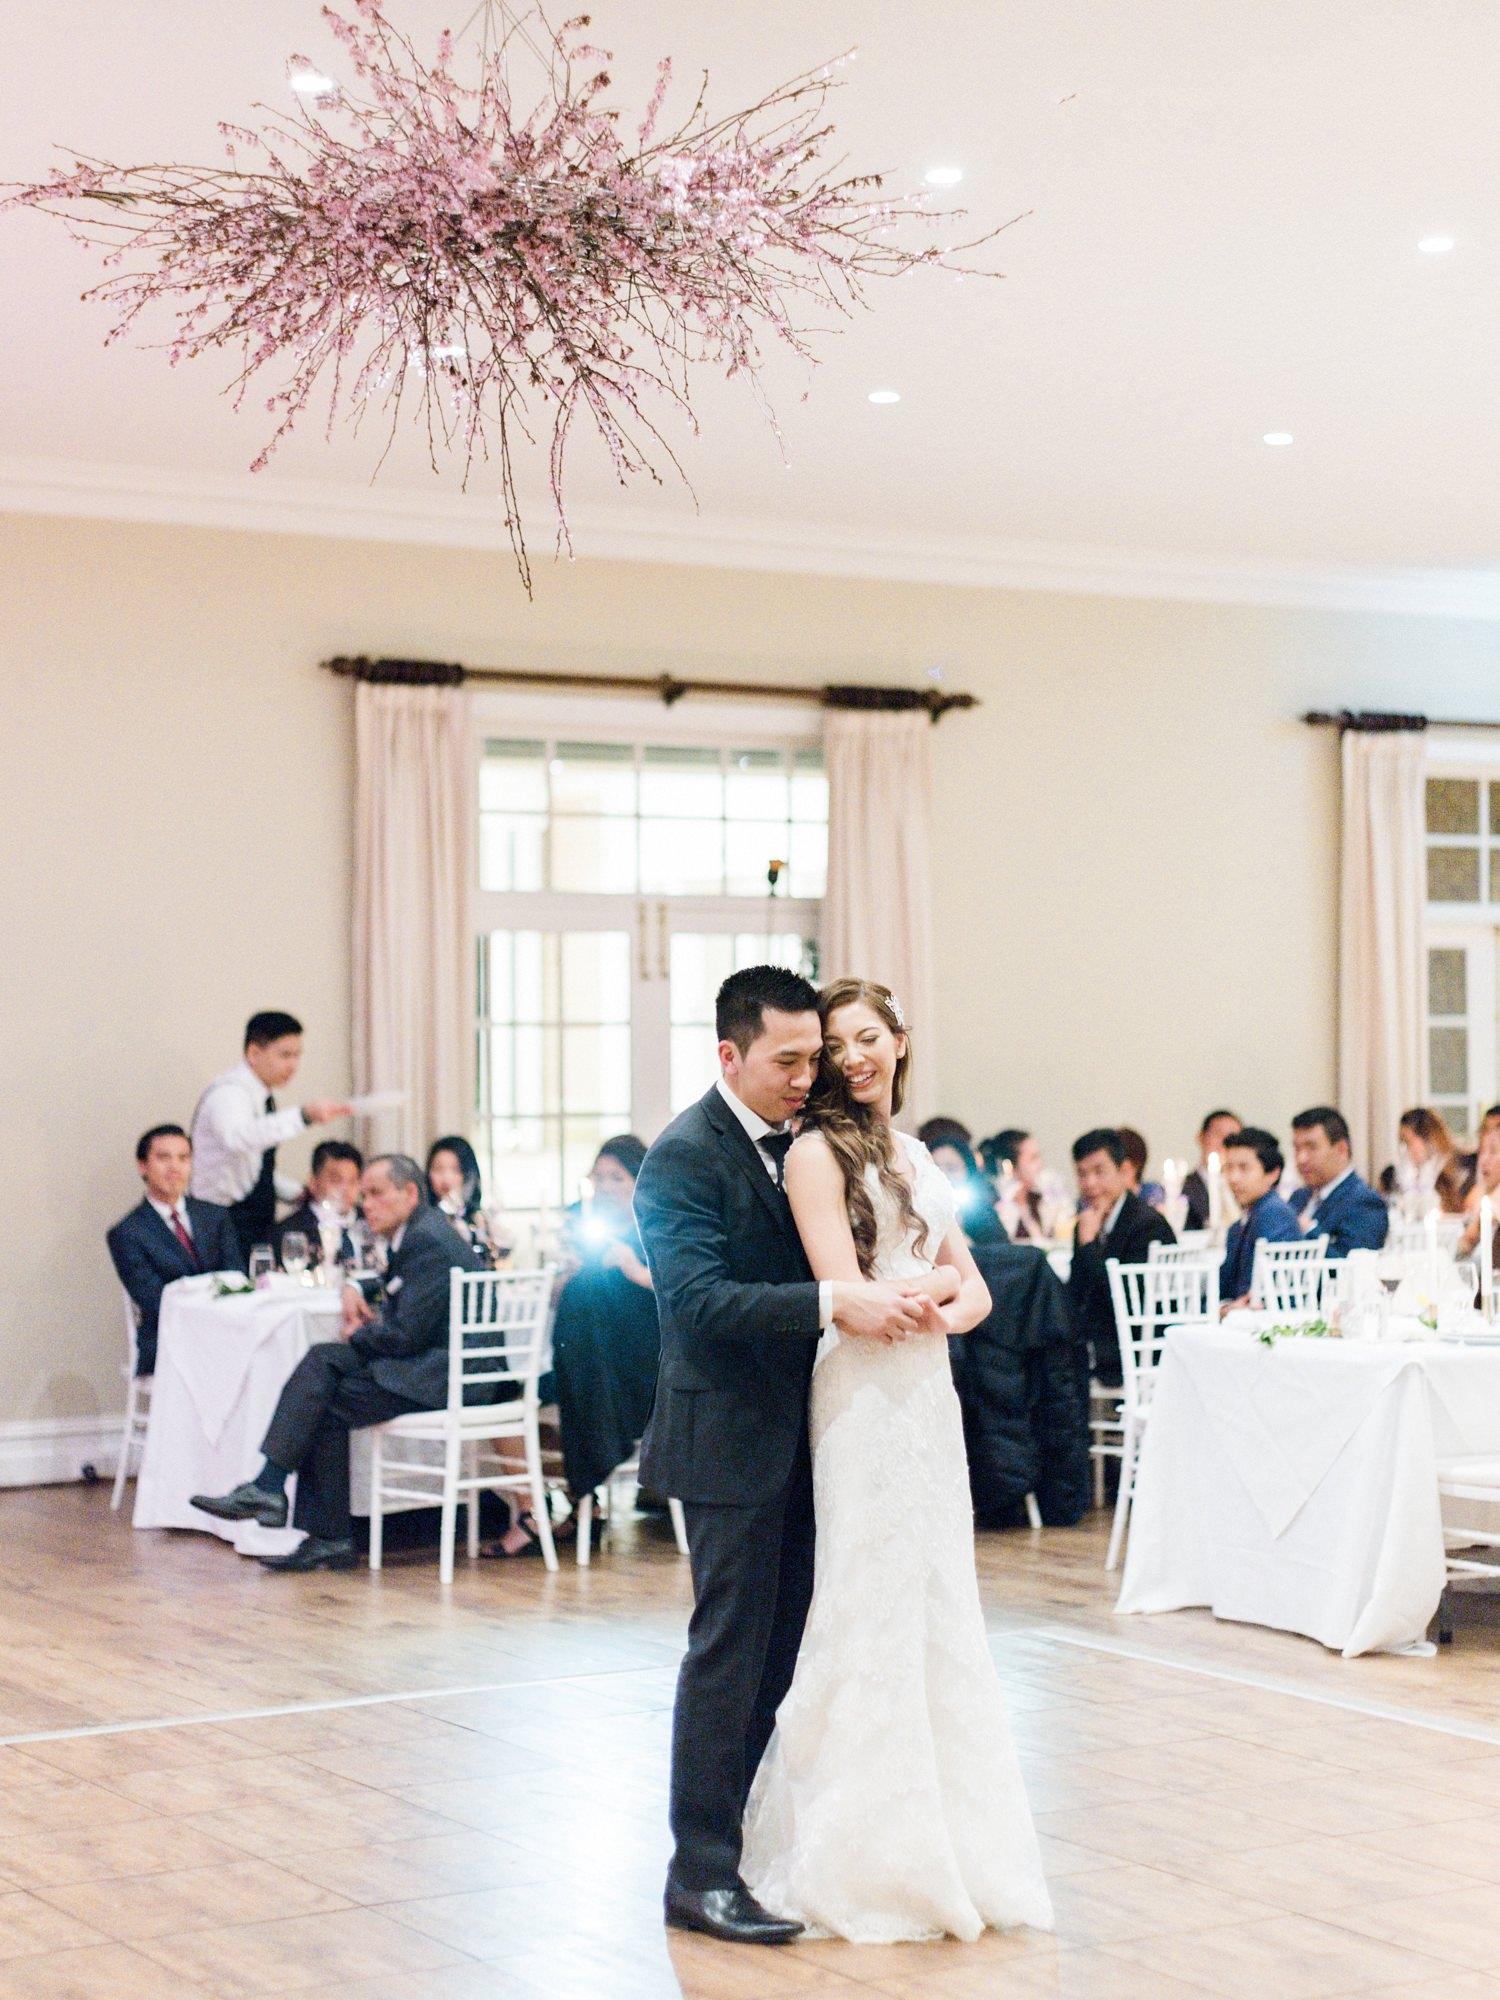 Somphors&dong-wedding-0919.jpg